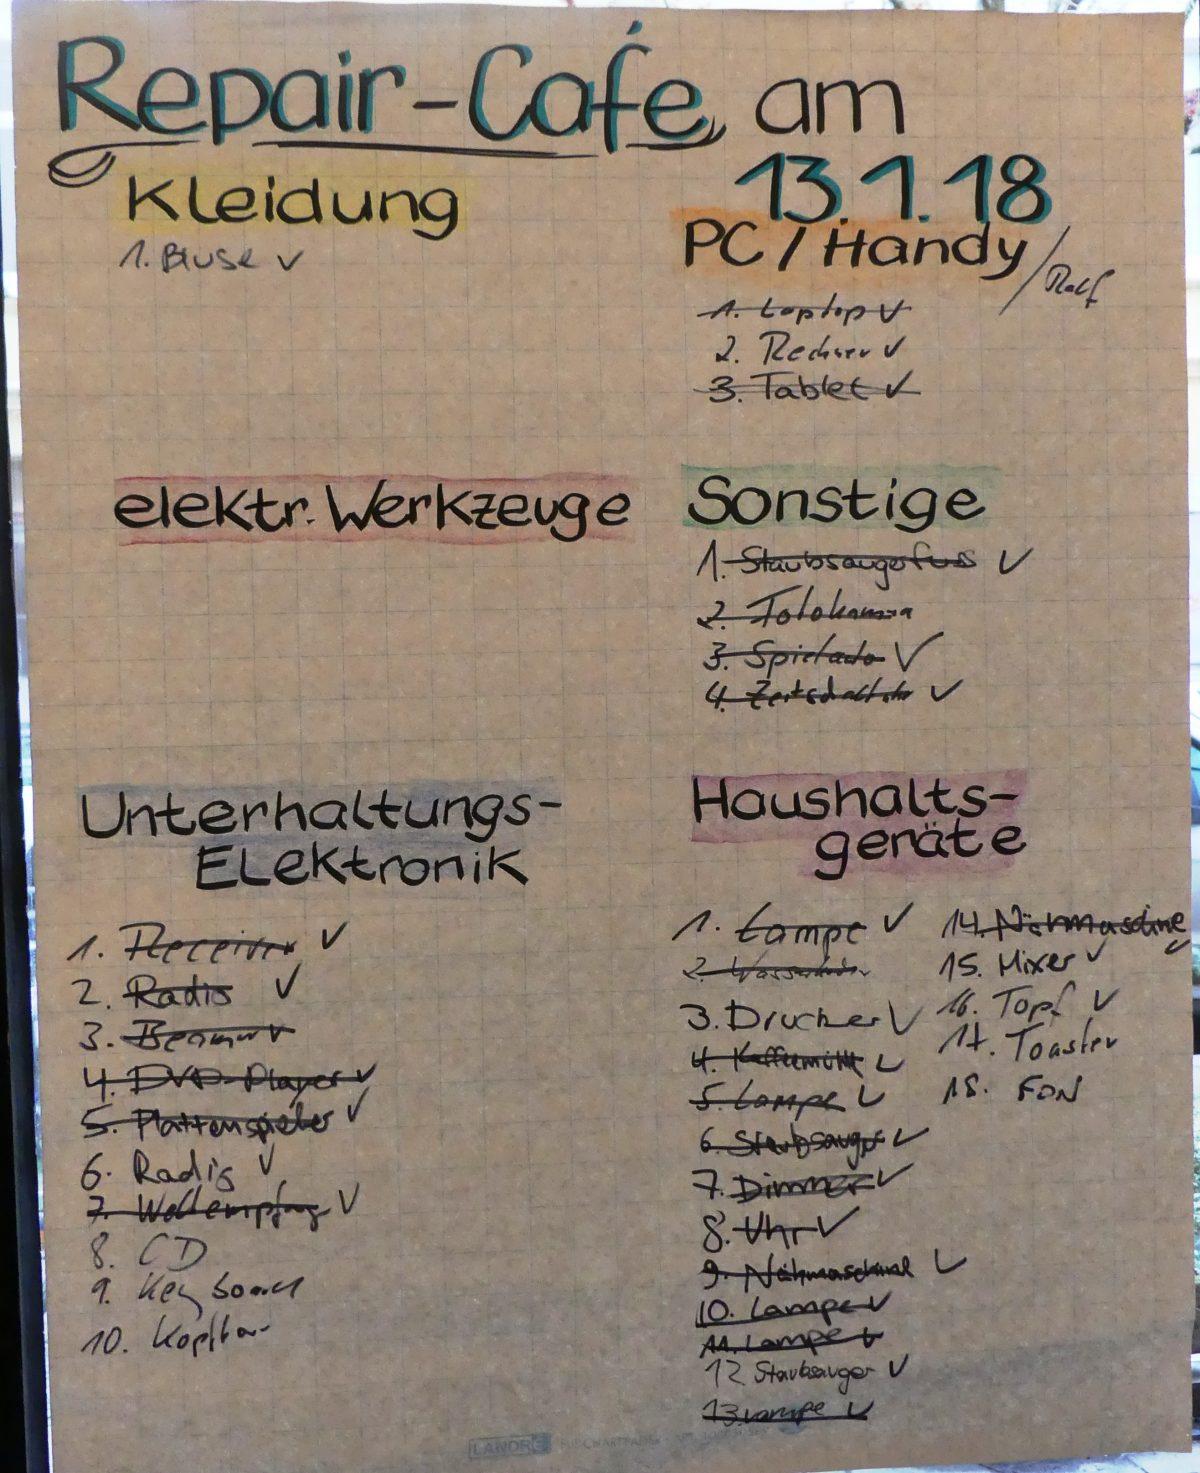 Rückblick Repair-Cafe 13.01.2018